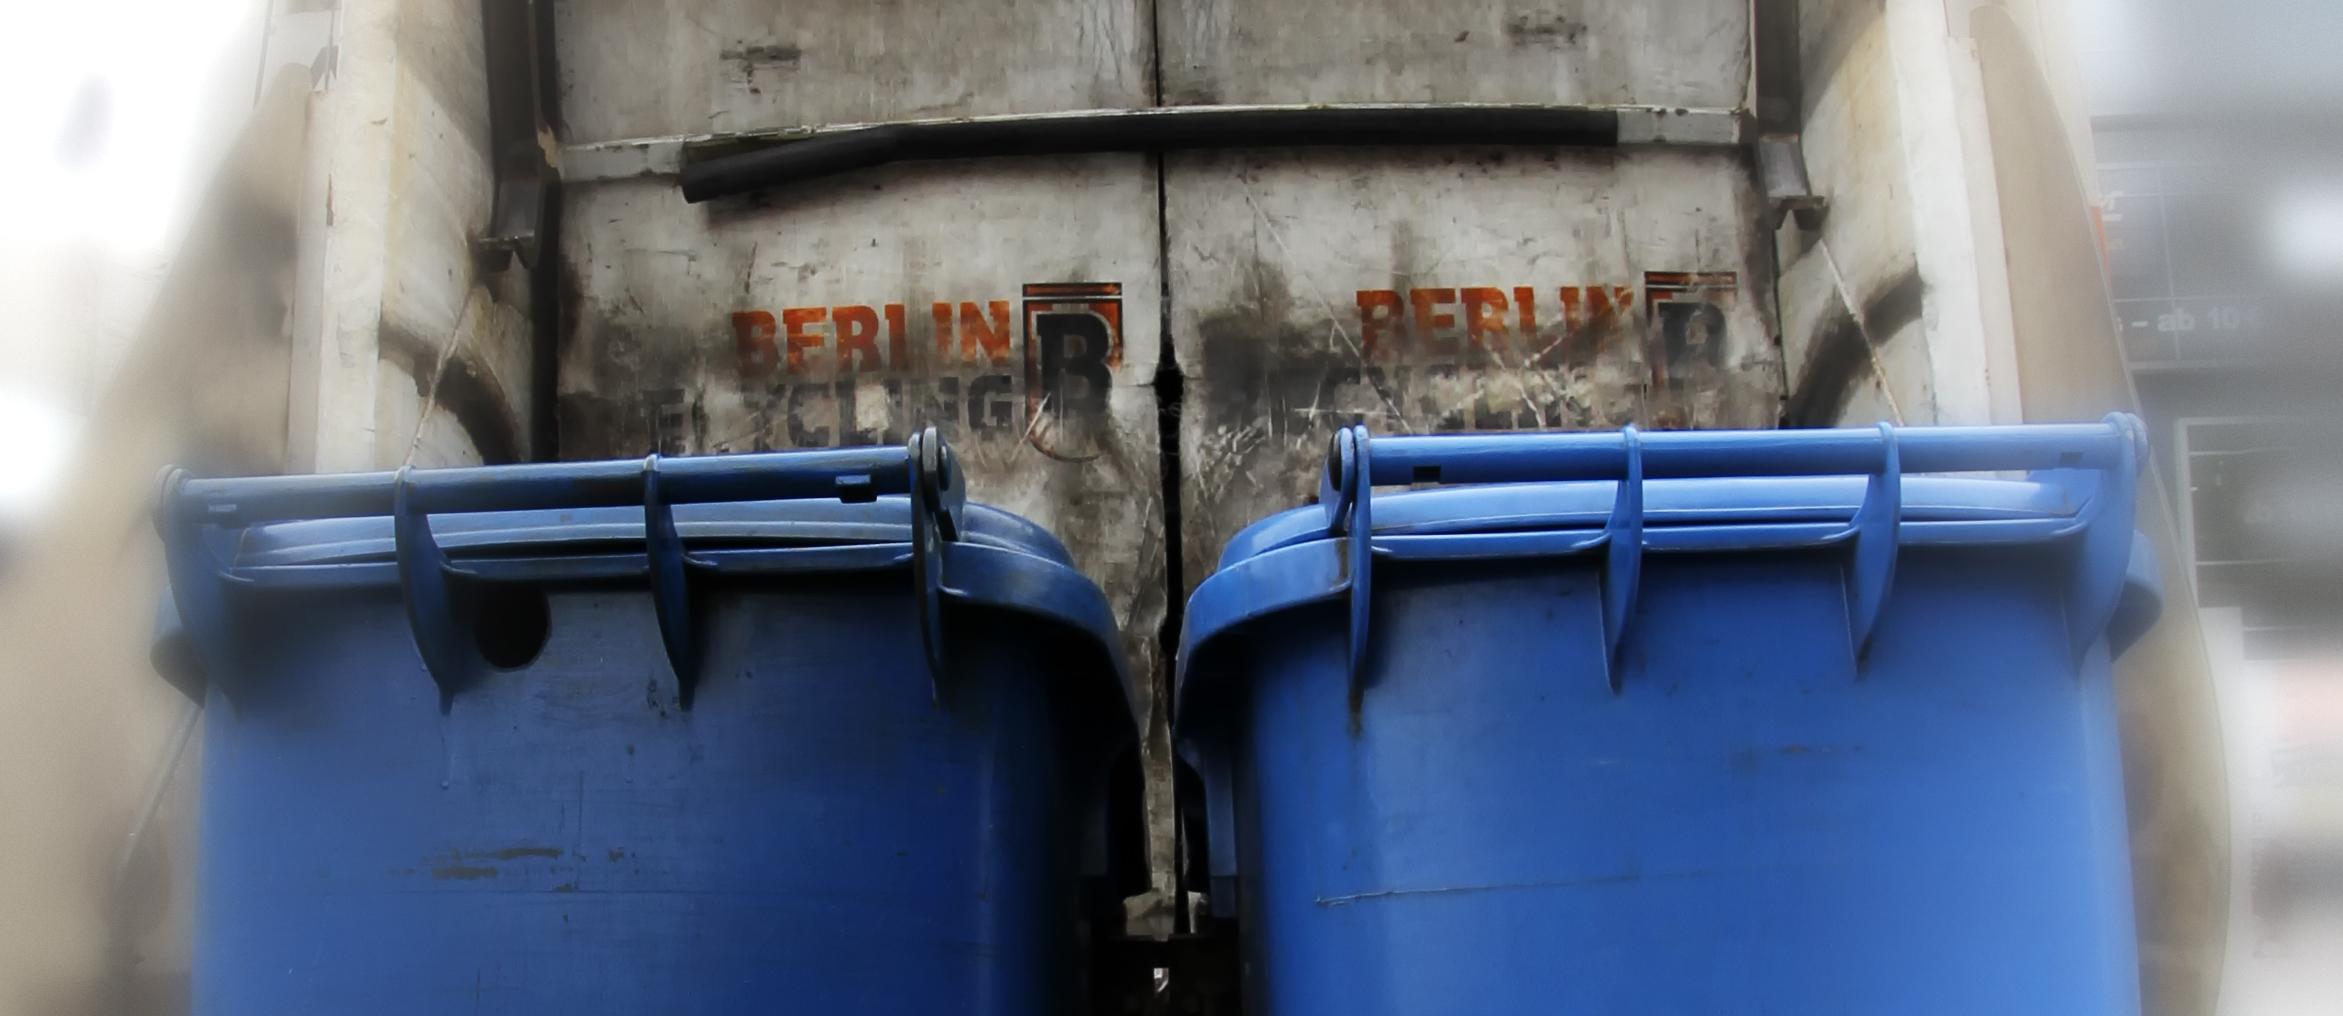 Berlin Recycling